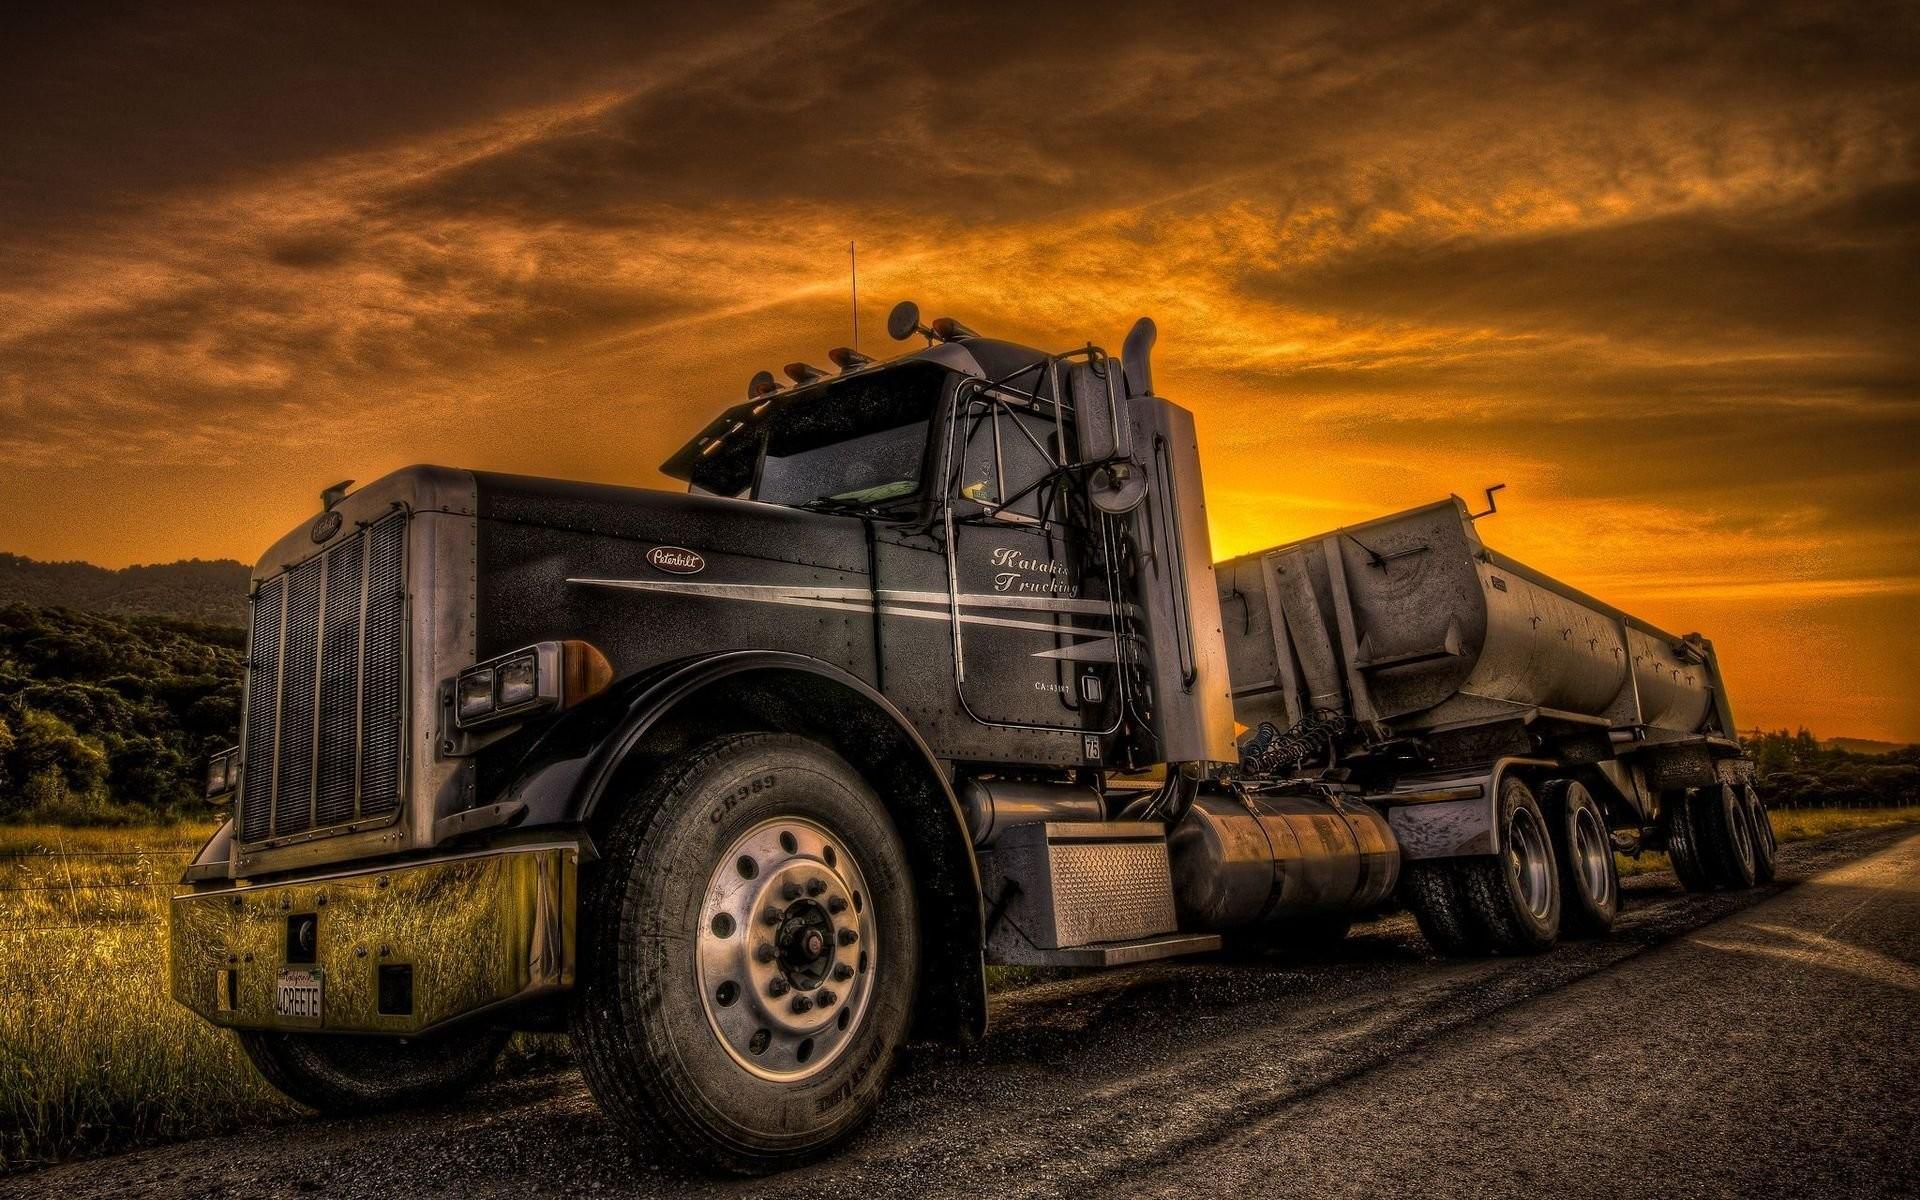 Old Chevy Truck Wallpapers – WallpaperSafari